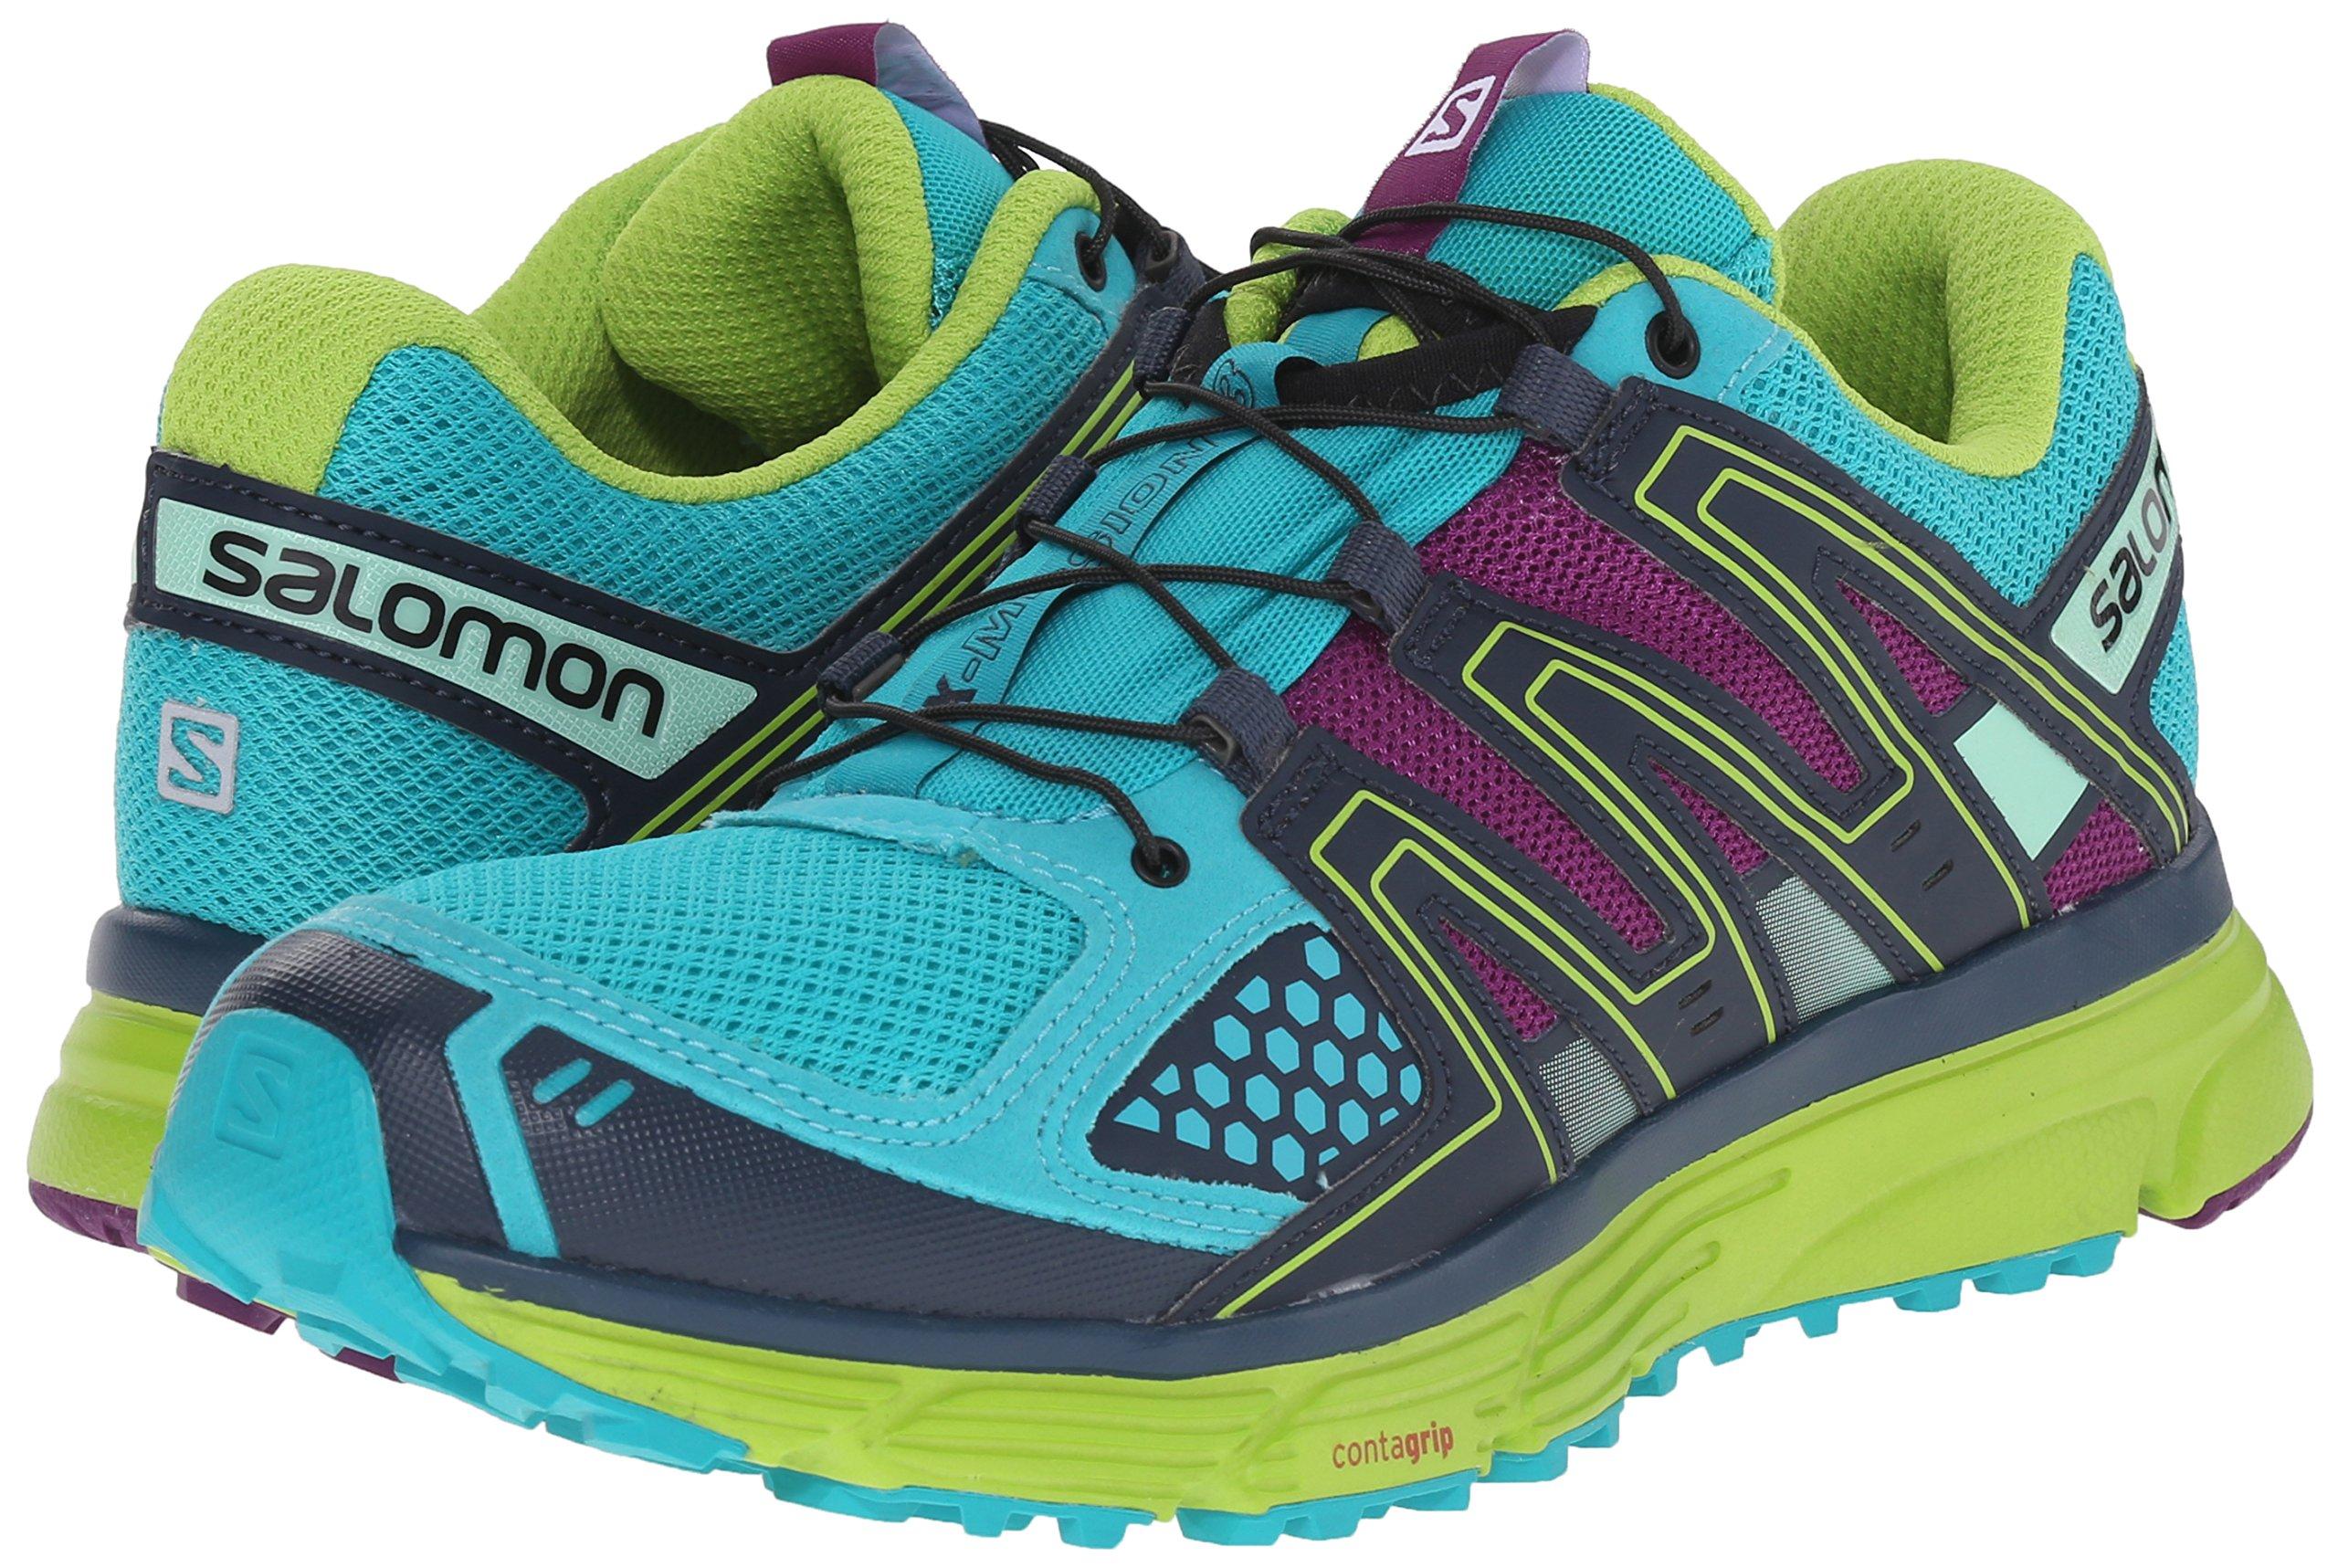 Salomon Women's X-Mission 3 W Trail Running Shoe, Teal Blue/Granny Green/Passion Purple, 7.5 B US by Salomon (Image #6)